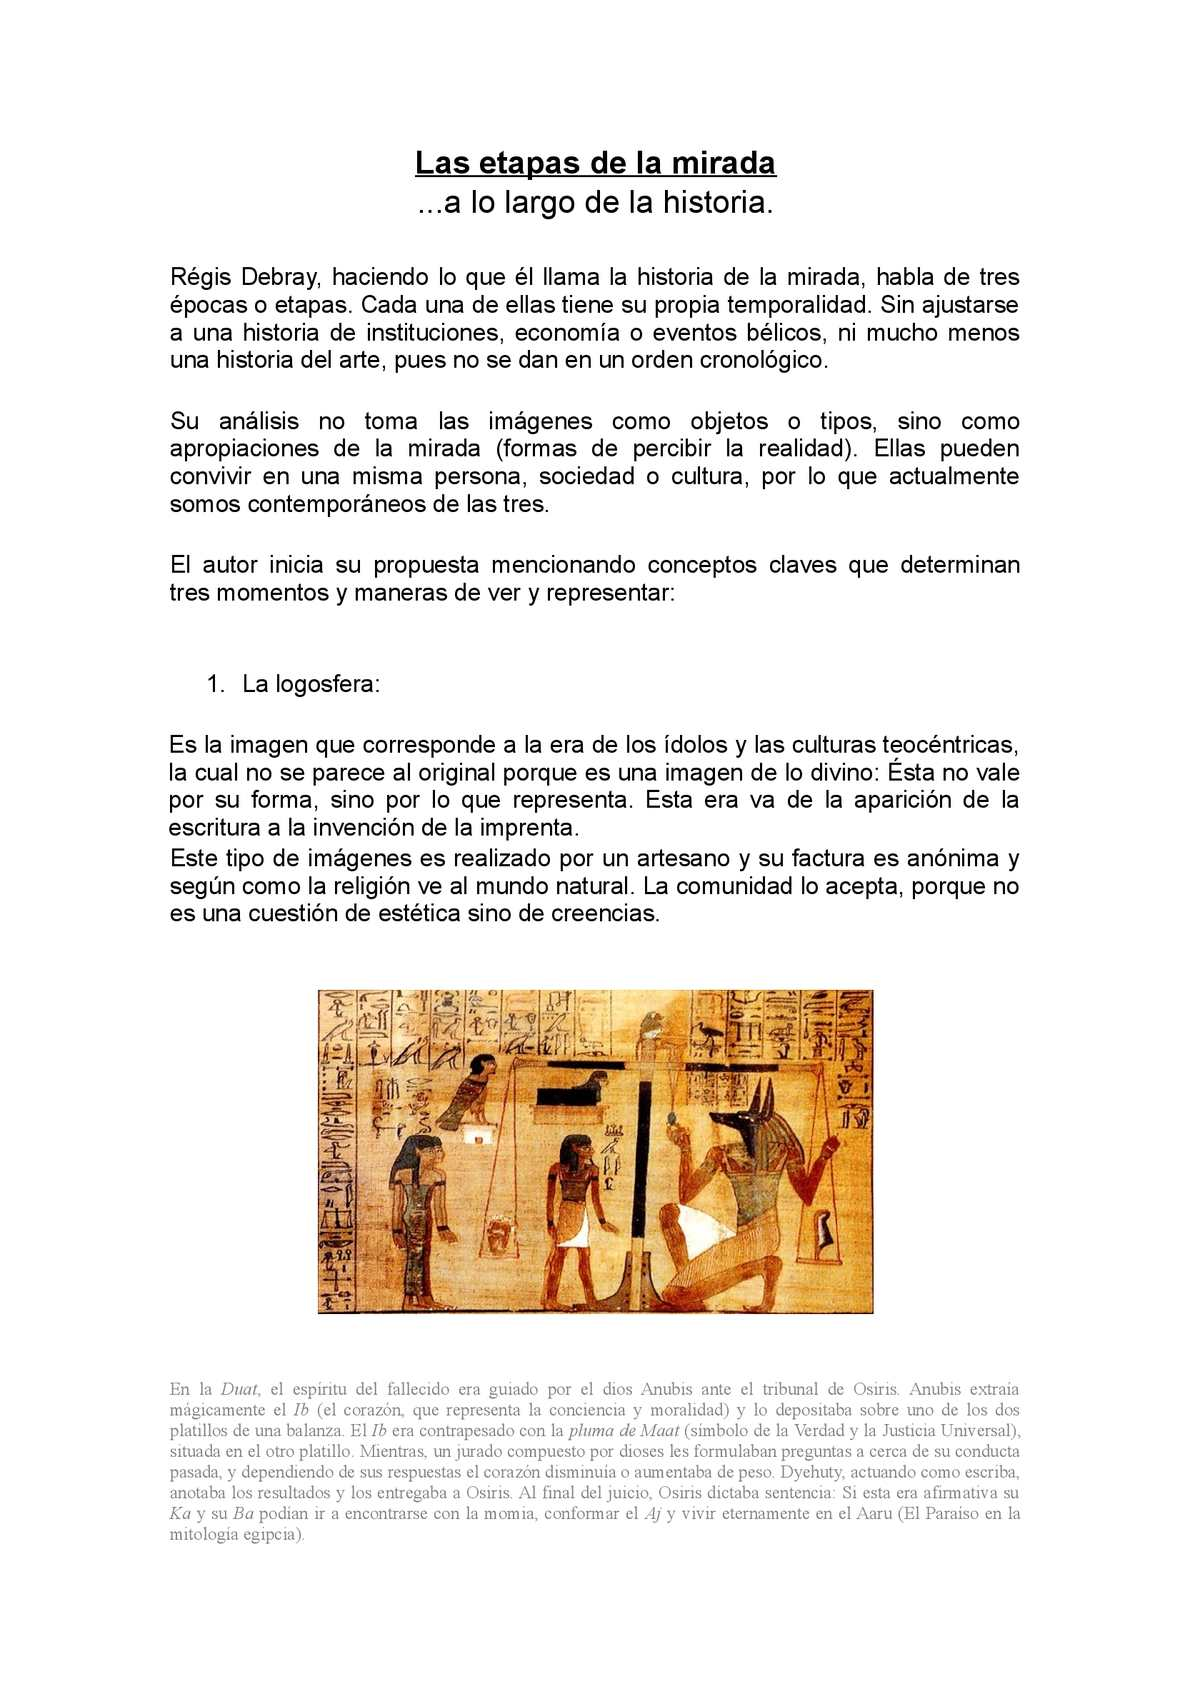 1-Historia de la mirada-Debray